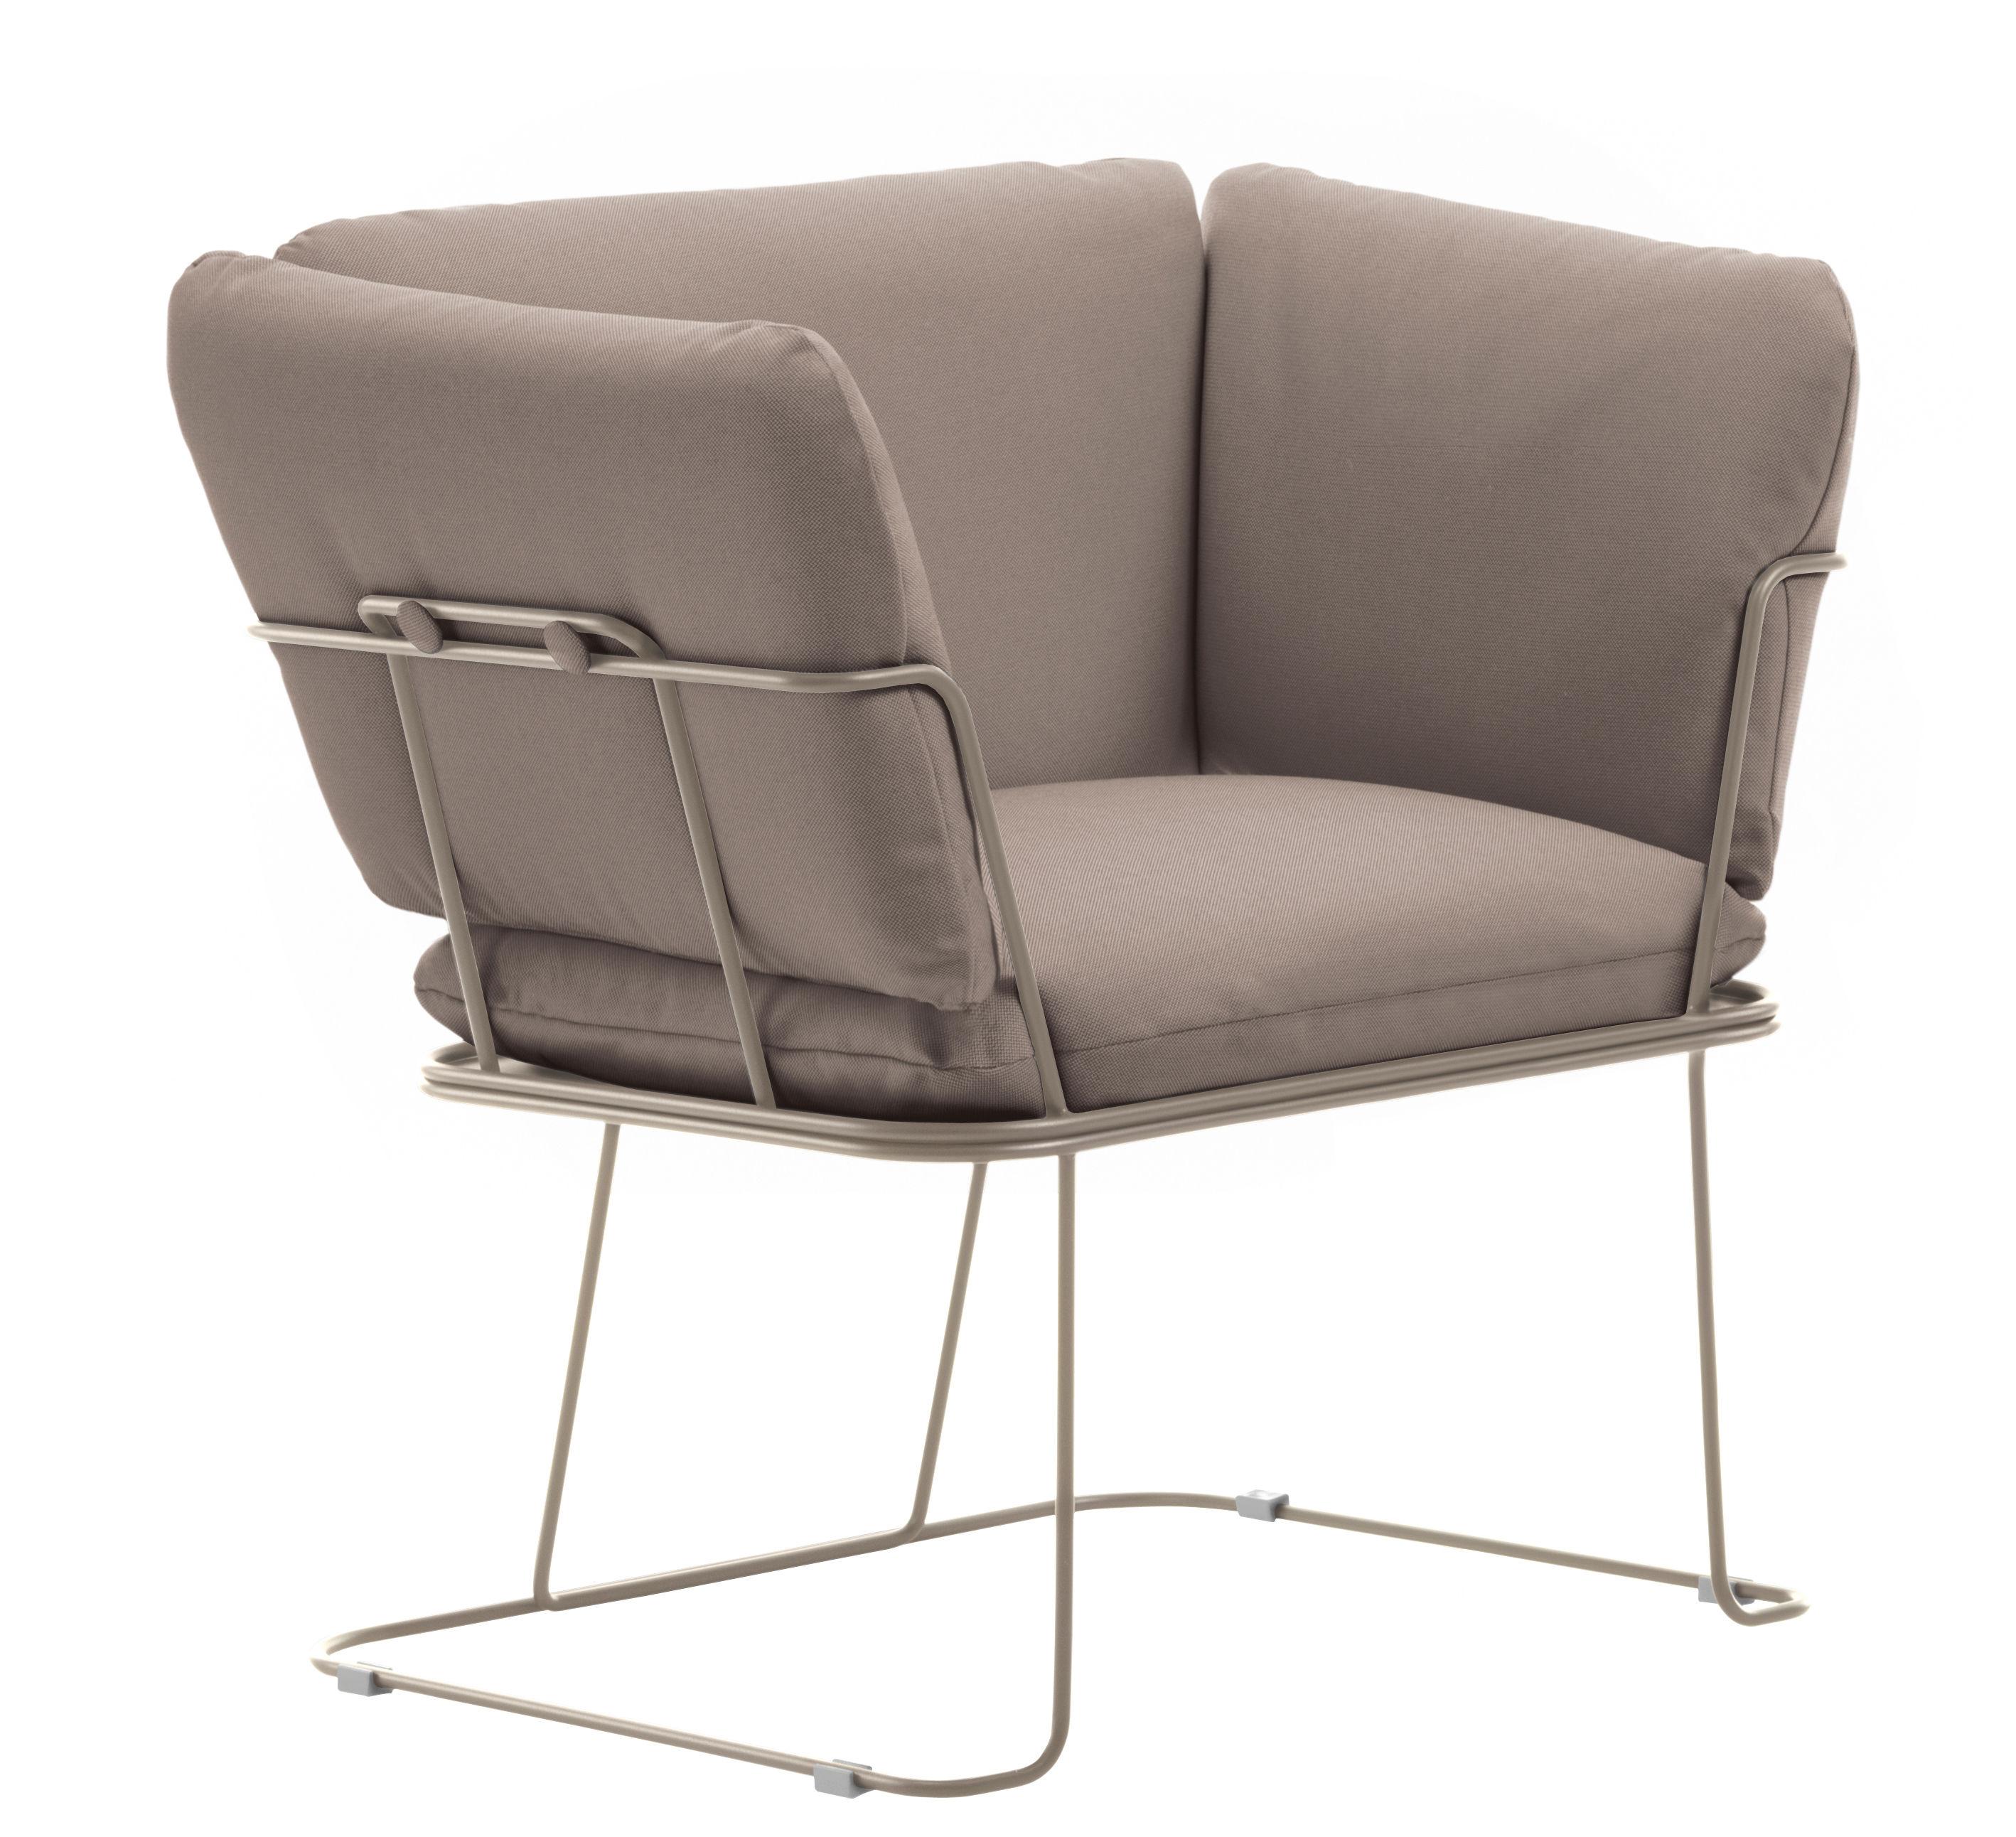 Möbel - Lounge Sessel - Merano Outdoor Gepolsterter Sessel / outdoorgeeignet - Stoff - B-LINE - Taupe / Gestell sandfarben - Acier galvanisé laqué, Kvadrat-Gewebe, Mousse de polyuéthane